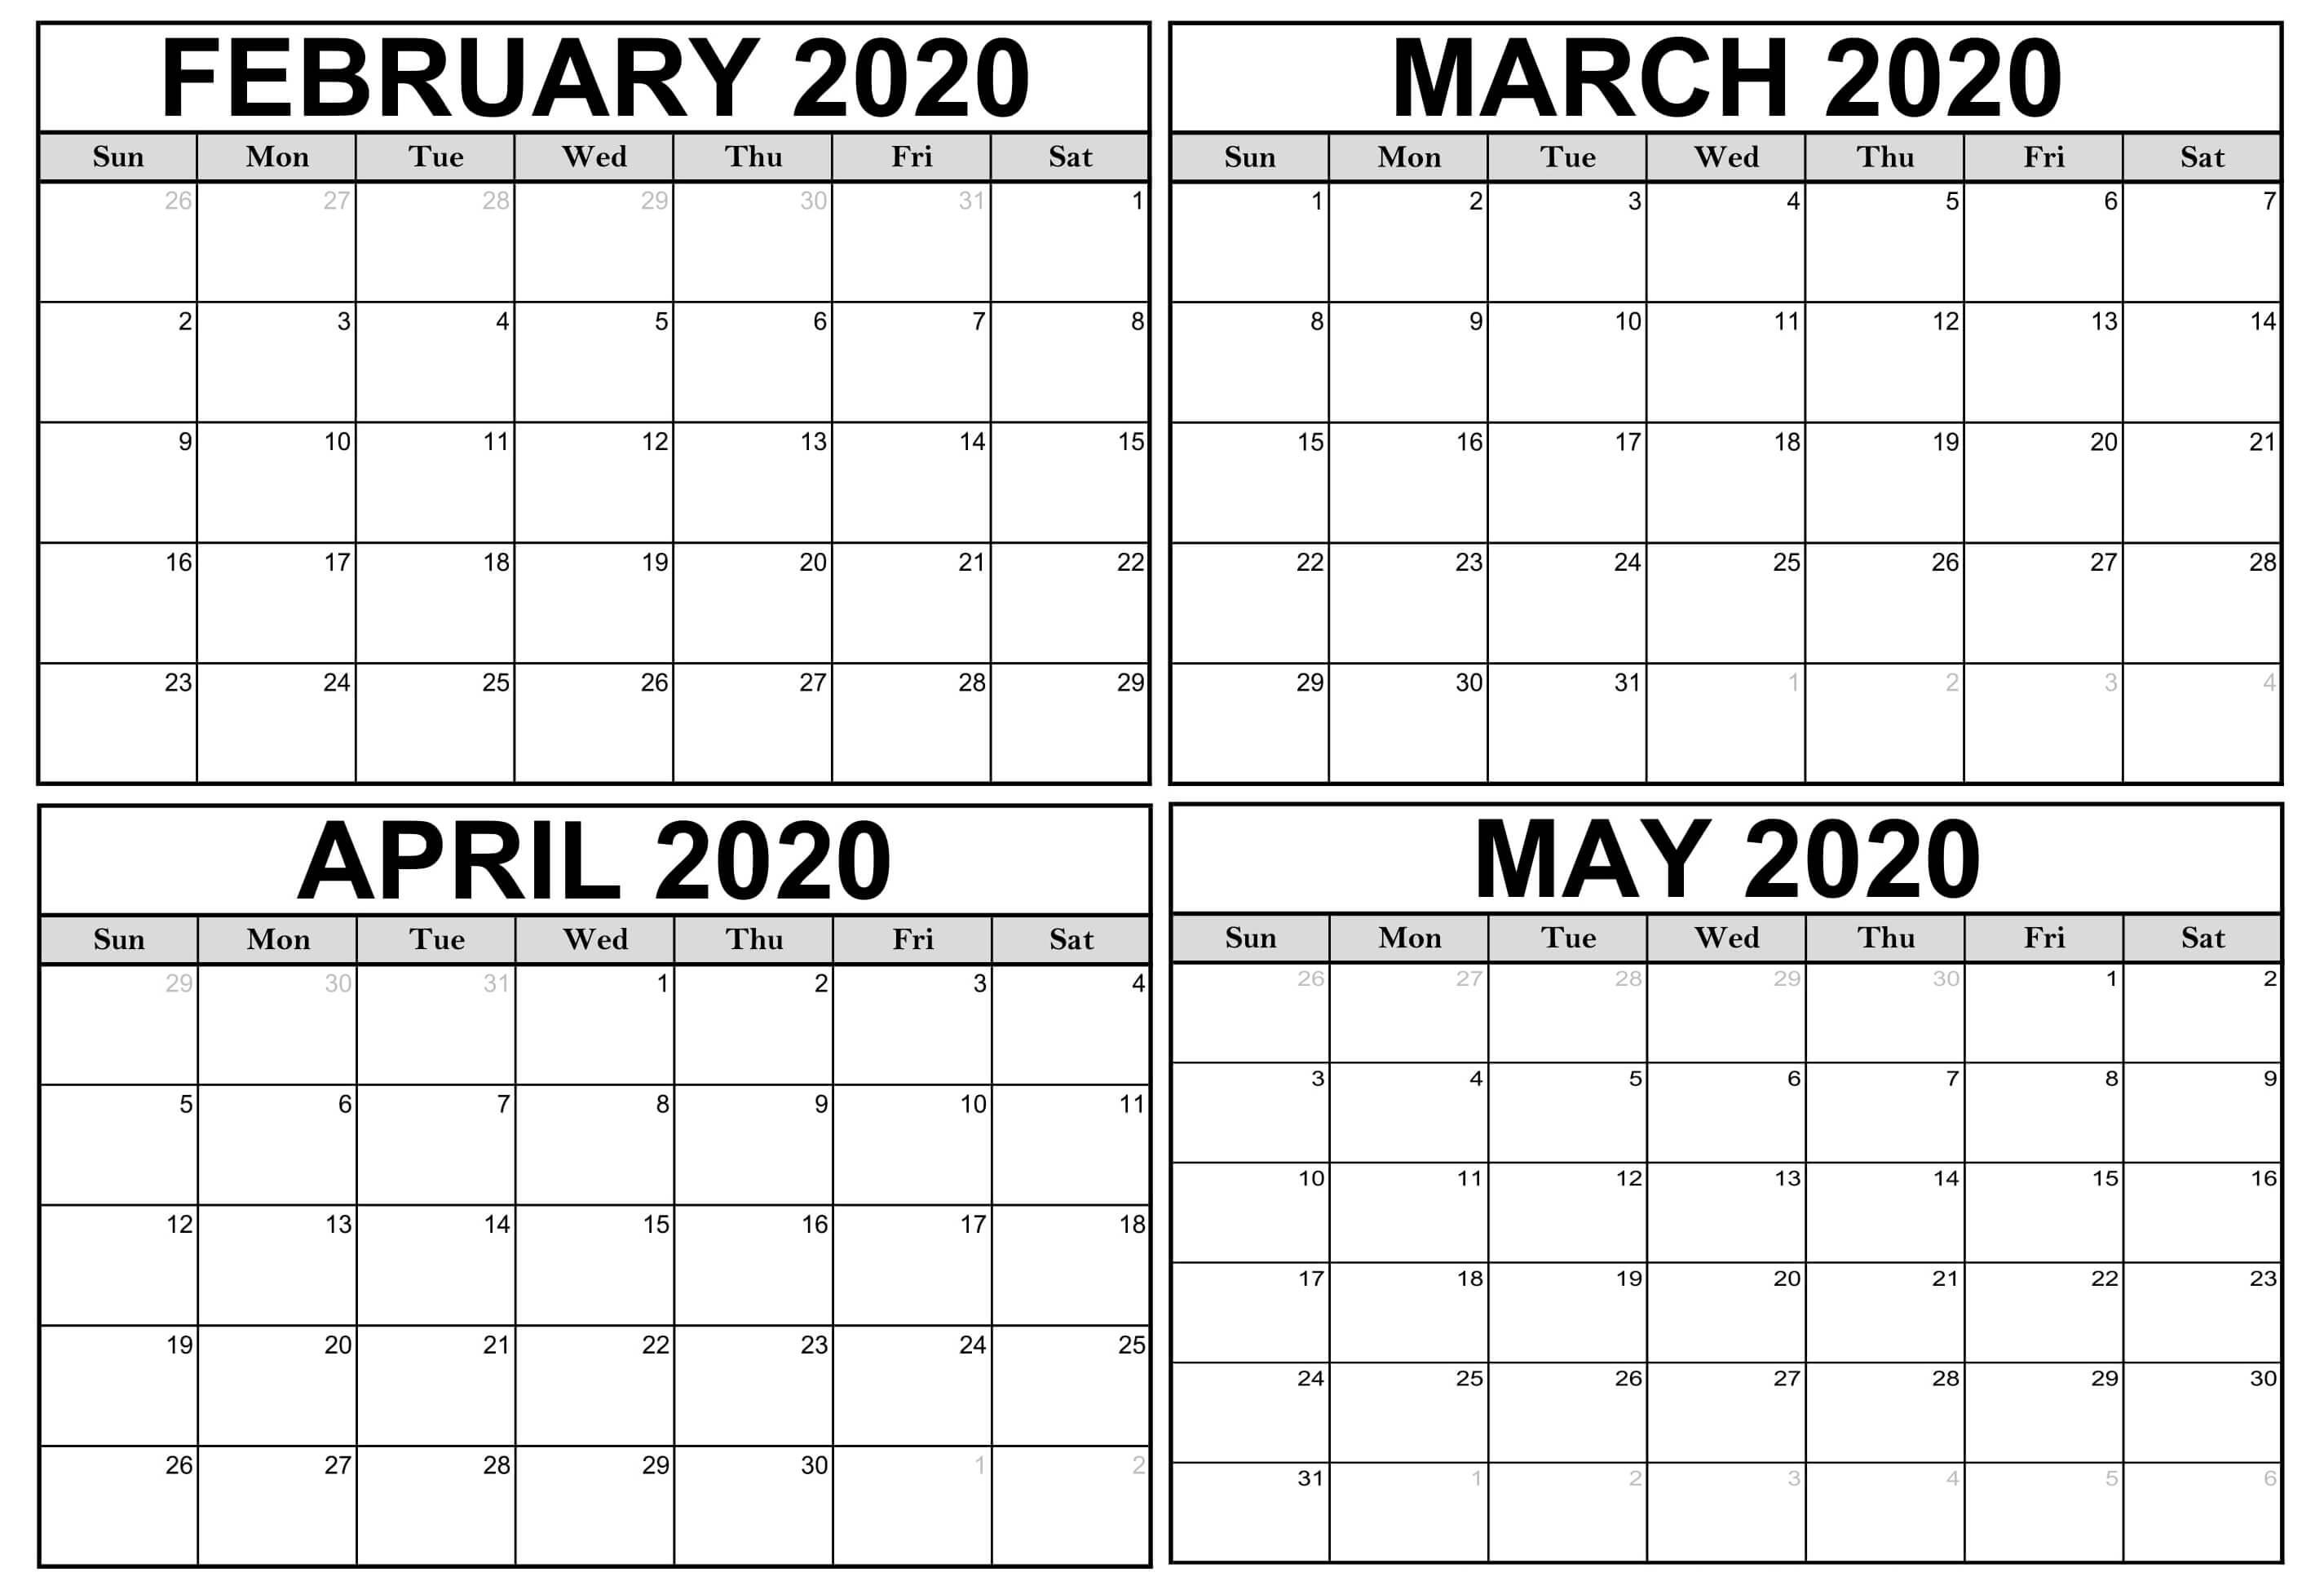 Blank February March Calendar 2020 Pdf - 2019 Calendars For